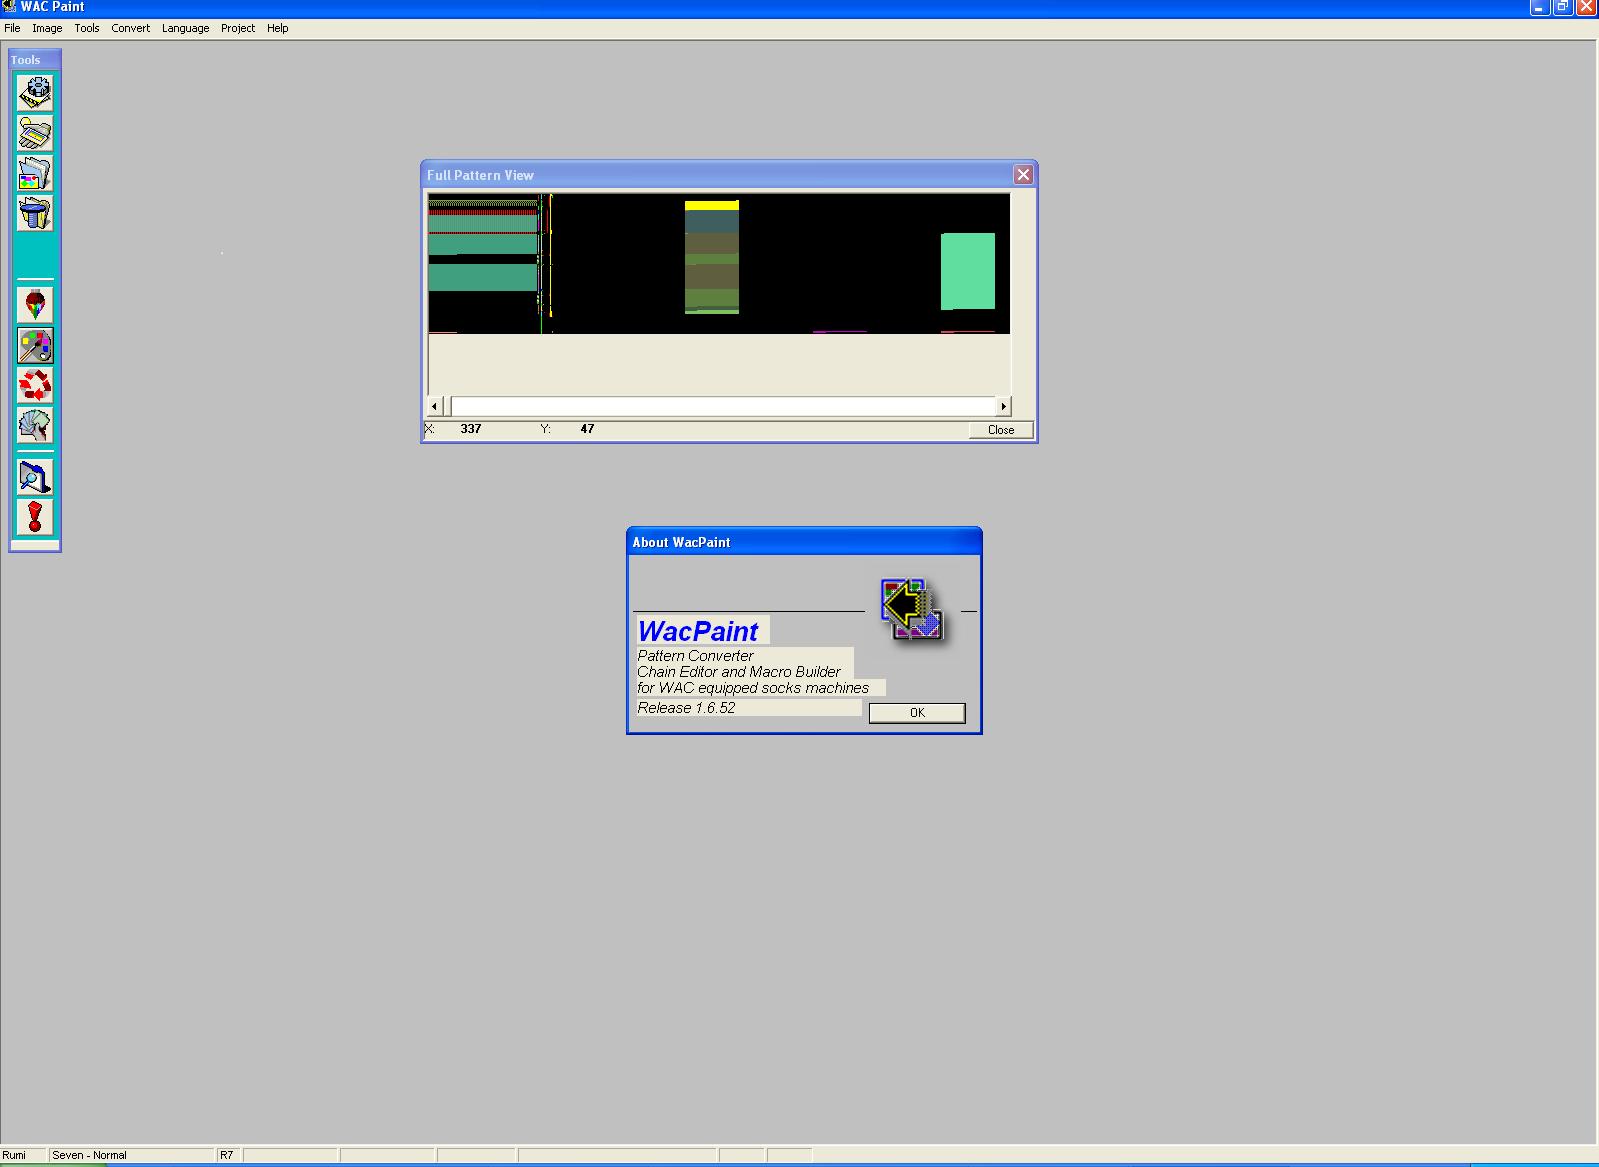 Wacpaint 1 6 52 Hardlock Dongle Emulator   Vip Dongle Team